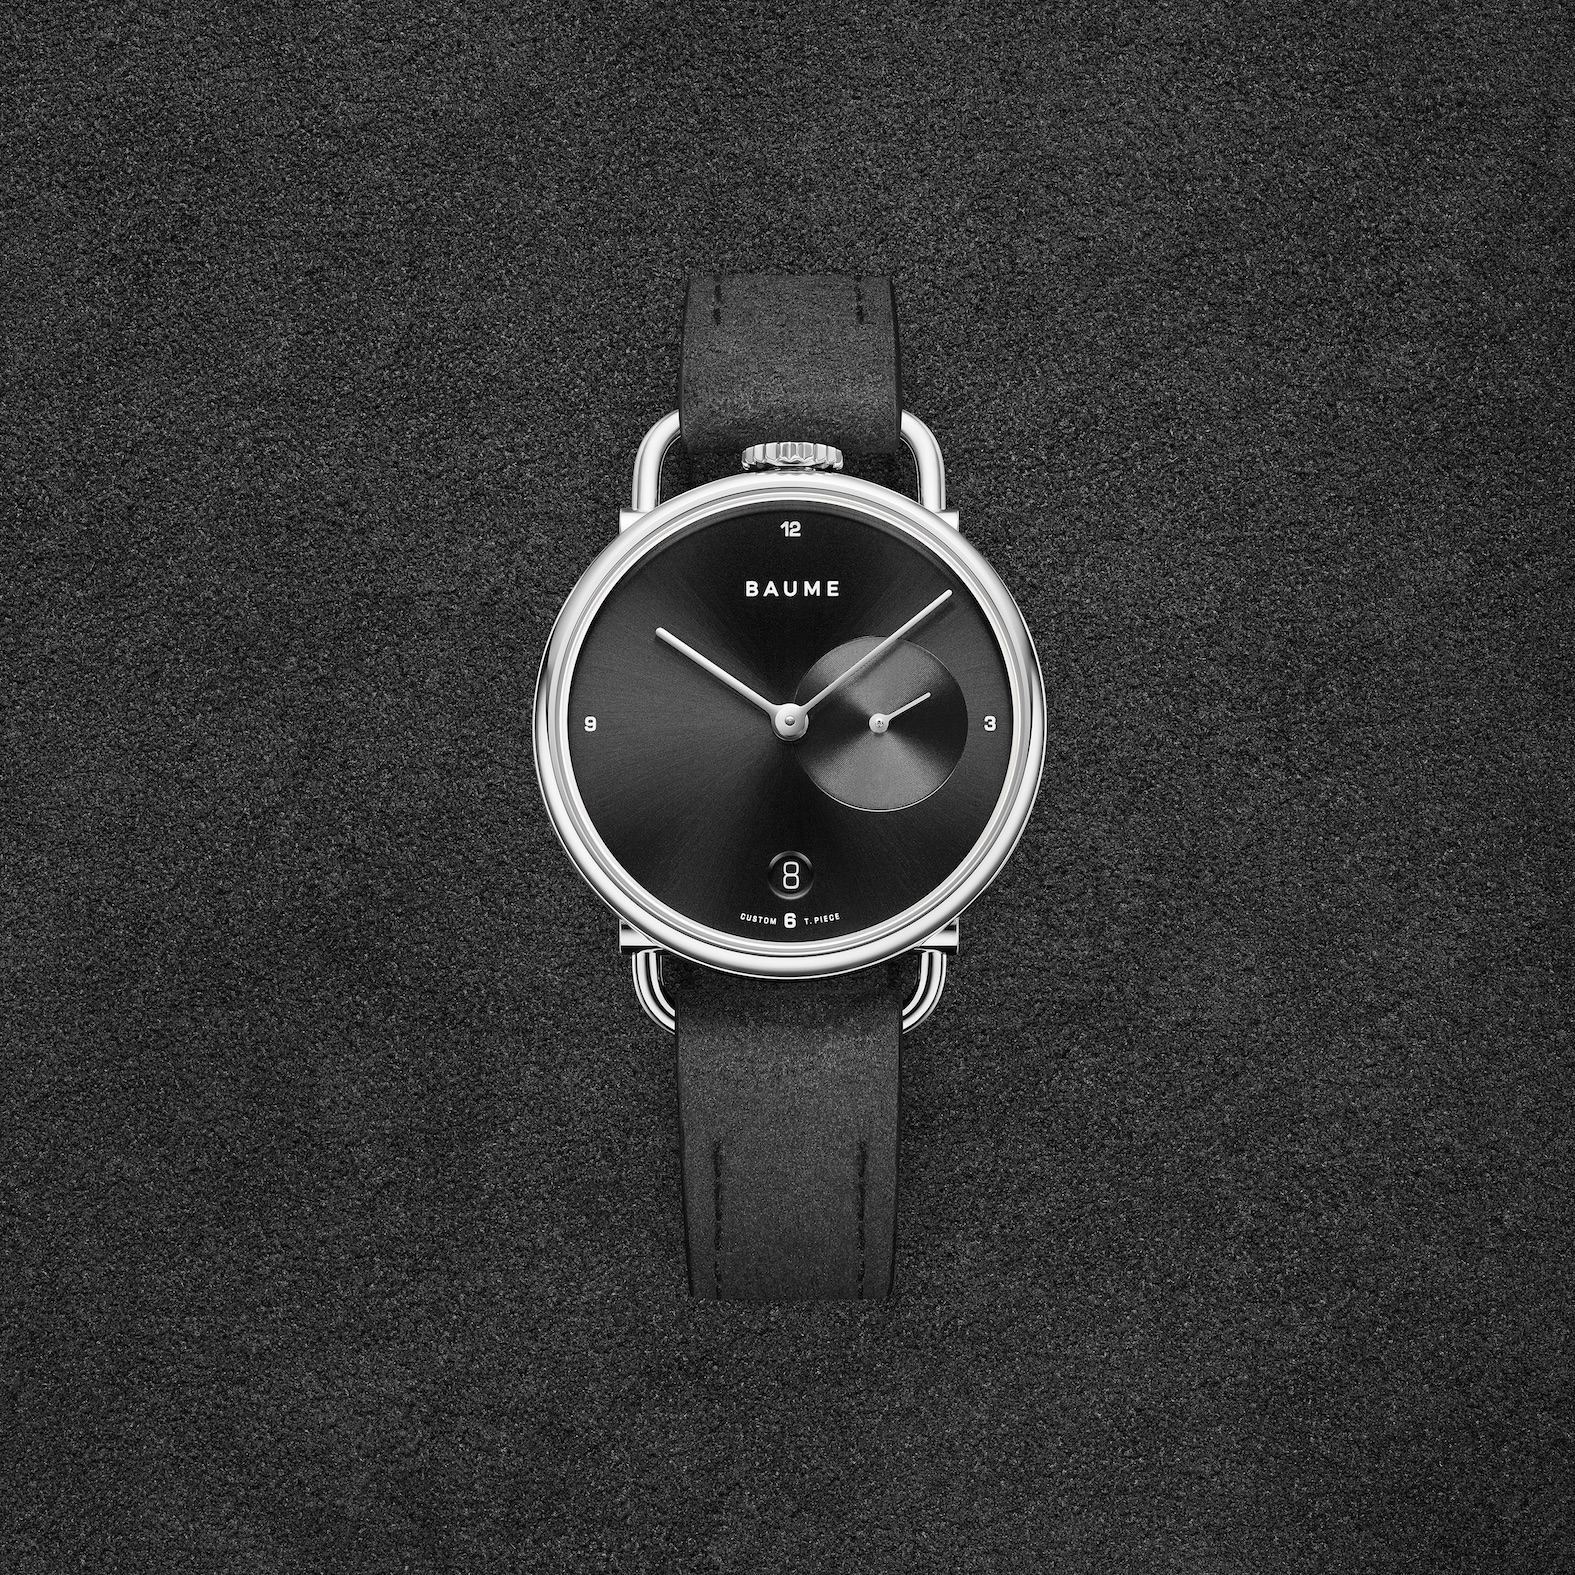 Baume Custom Timepiece Series watch with Alcantara strap.